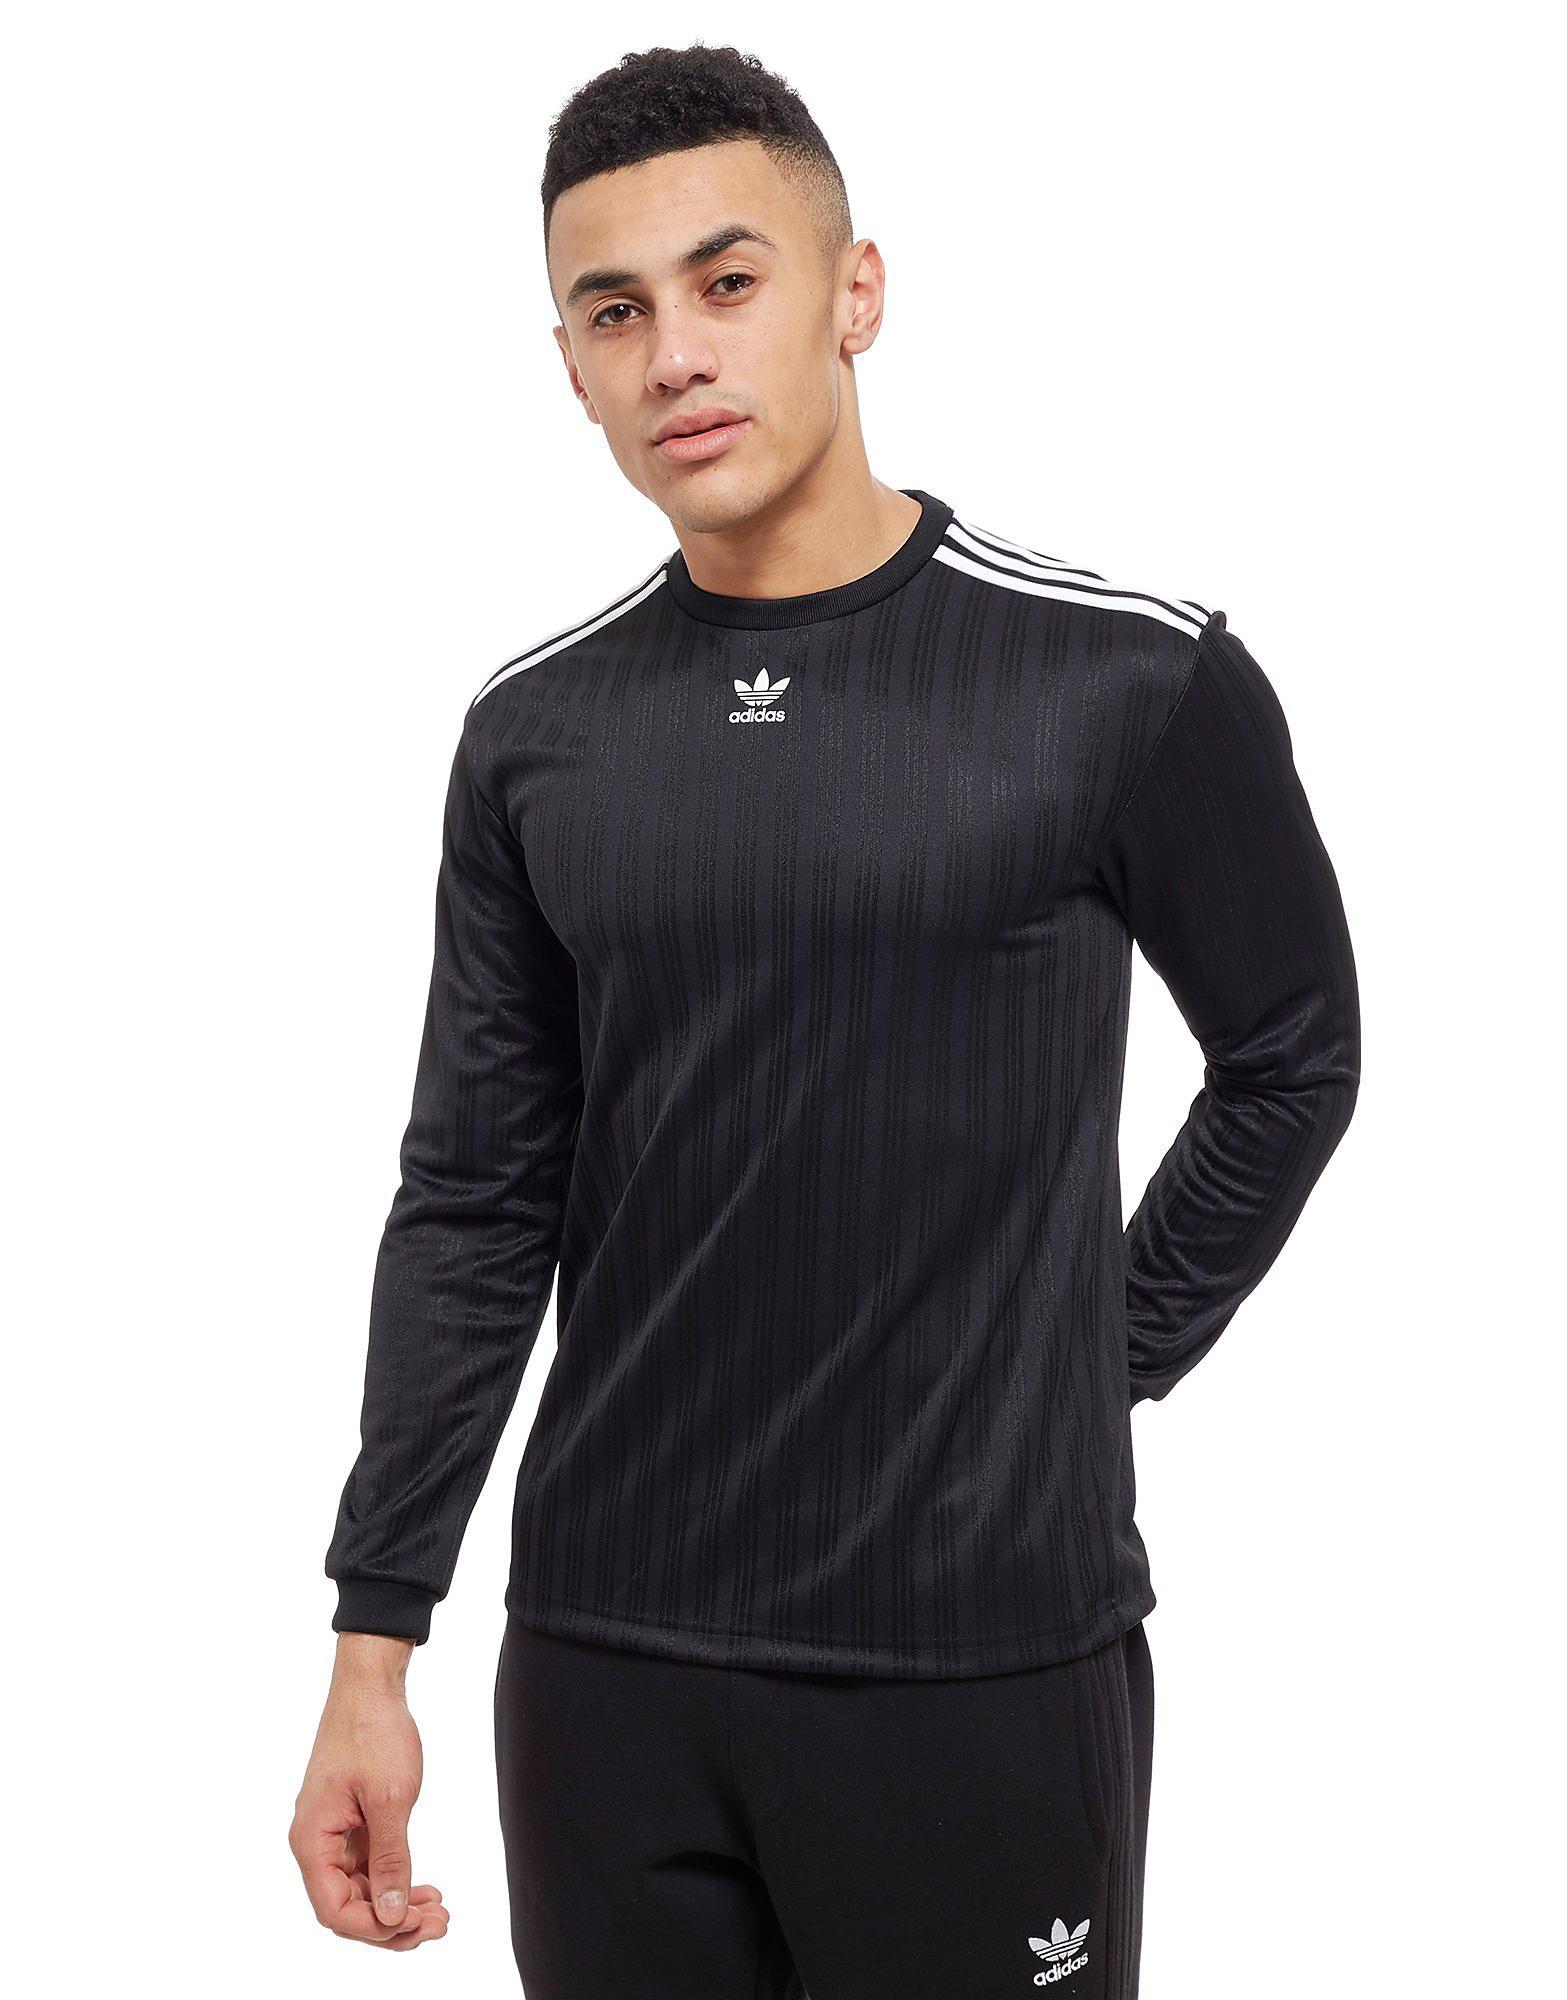 adidas Originals Trefoil Football Long Sleeve T-Shirt